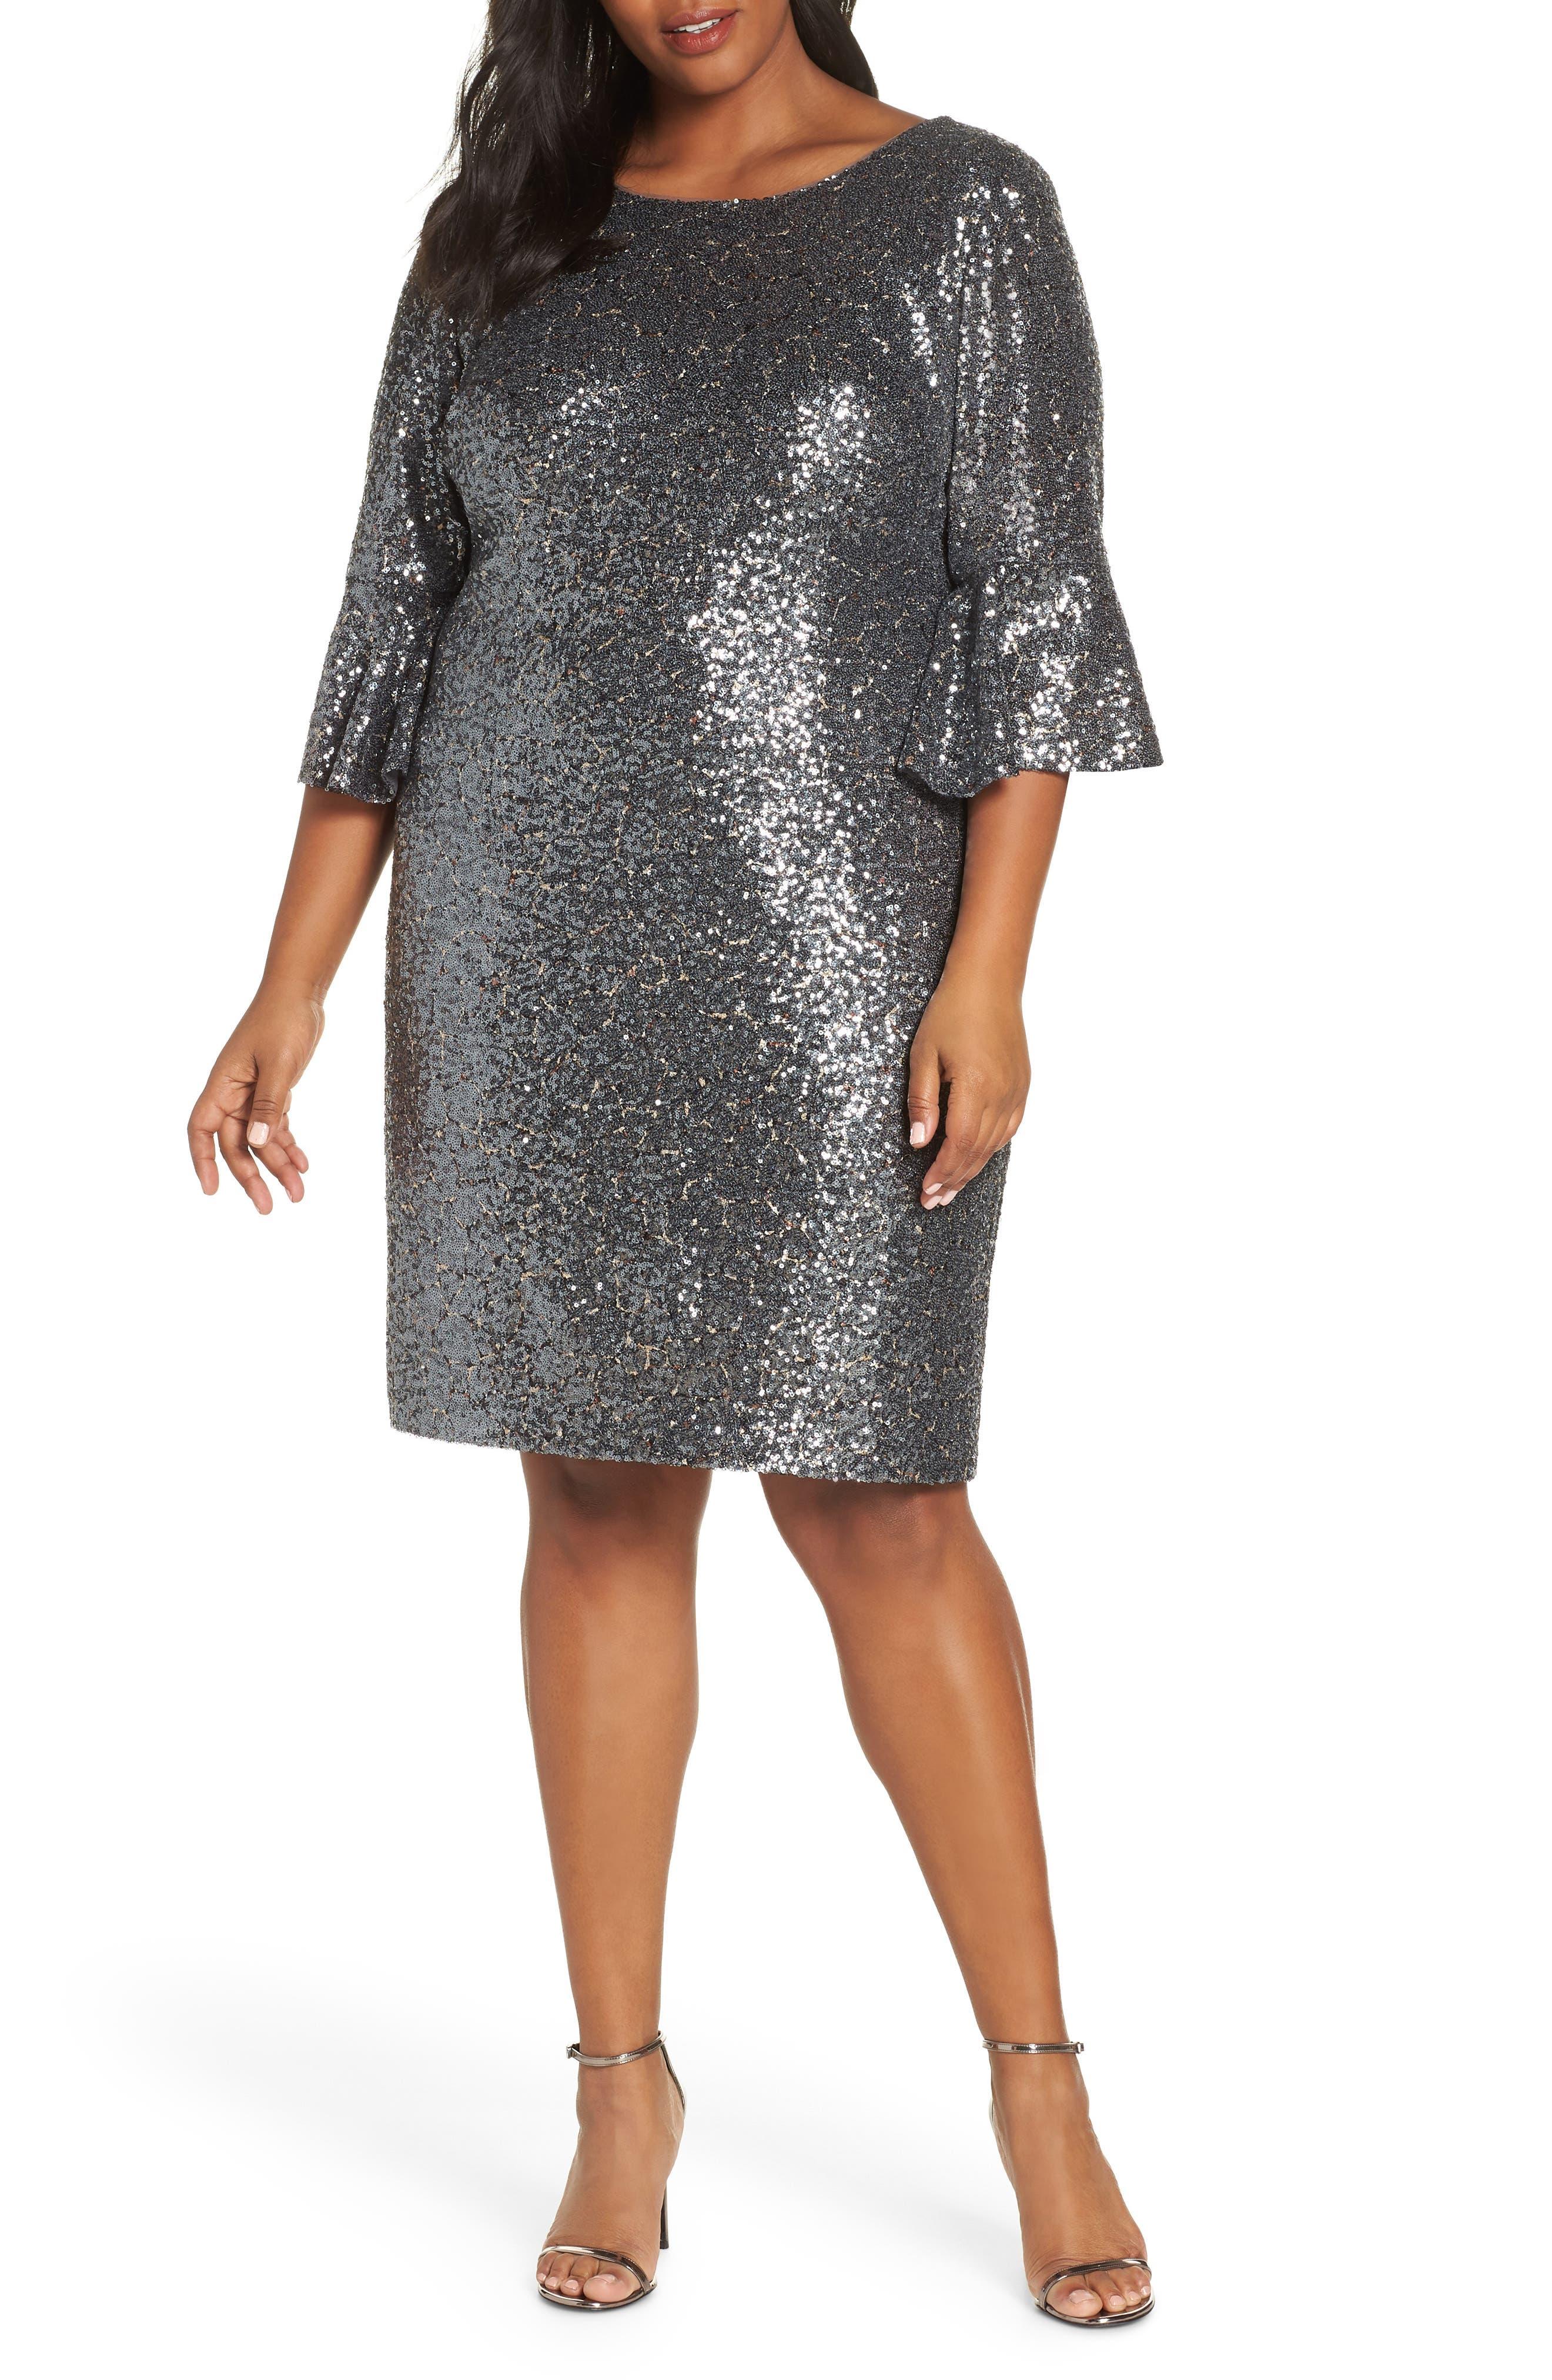 Plus Size Alex Evenings Ruffle Cuff Sequin Cocktail Dress